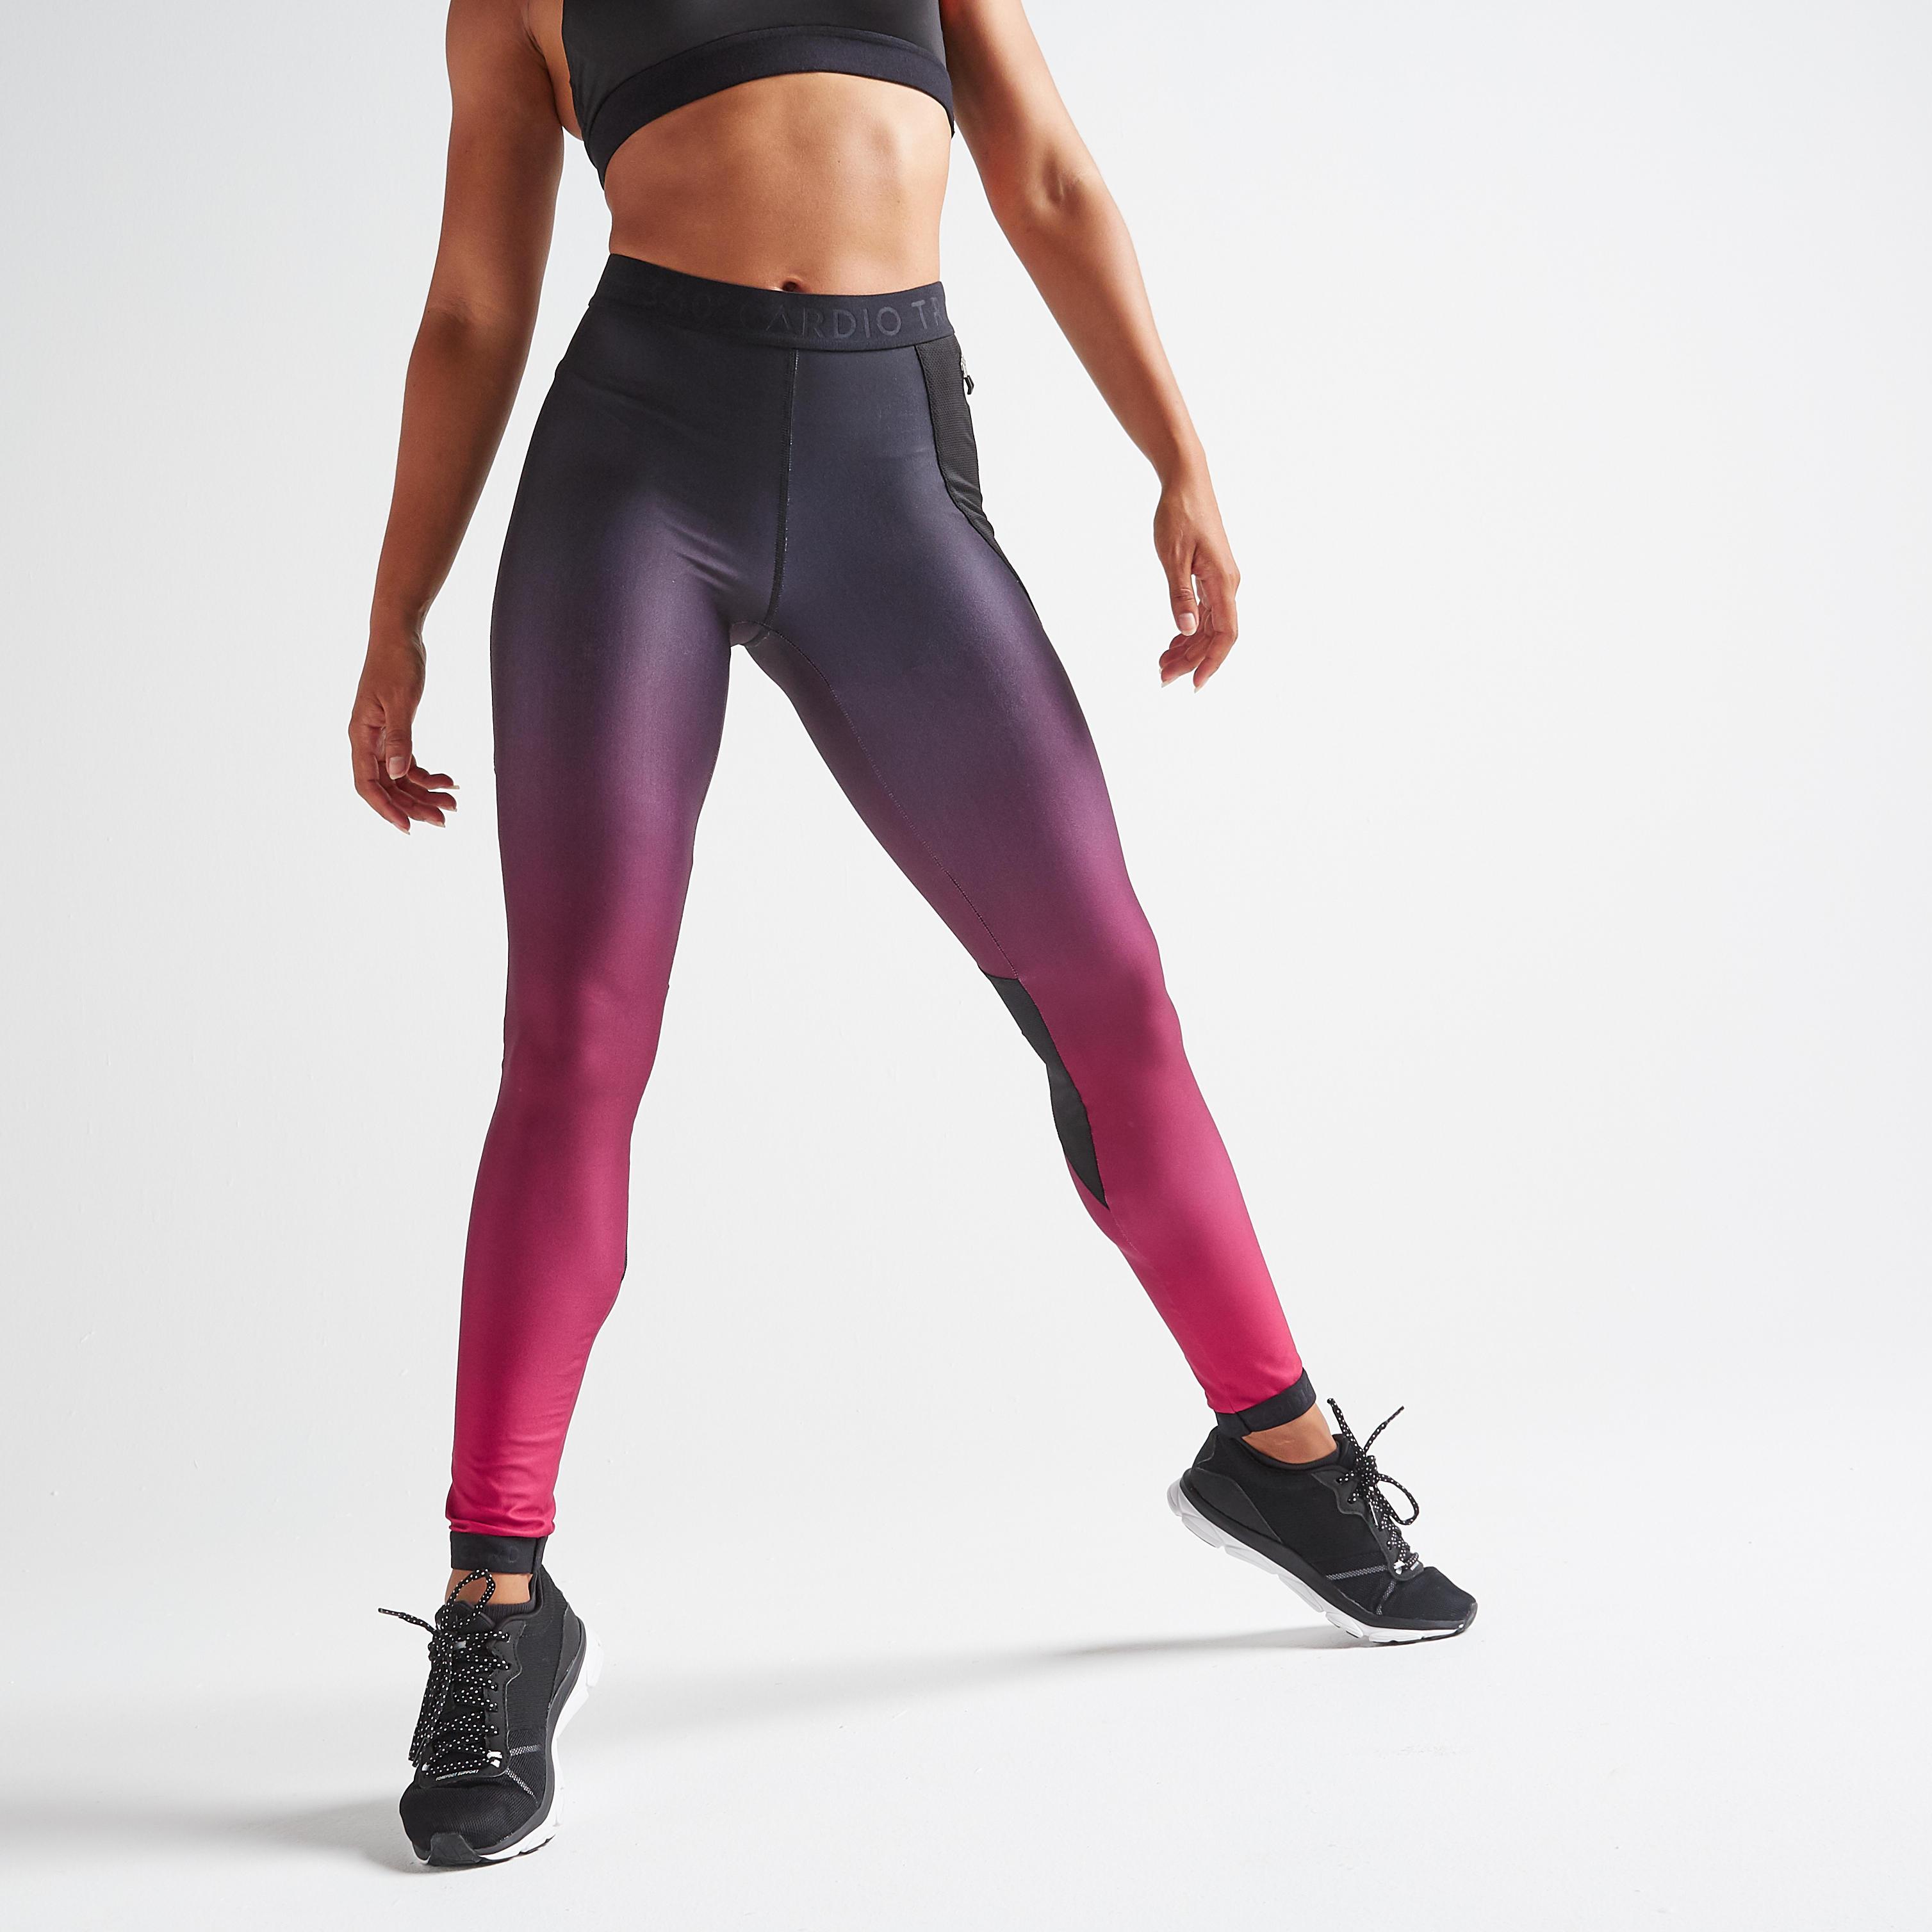 Legging fitness cardio training femme dégradé bordeaux domyos